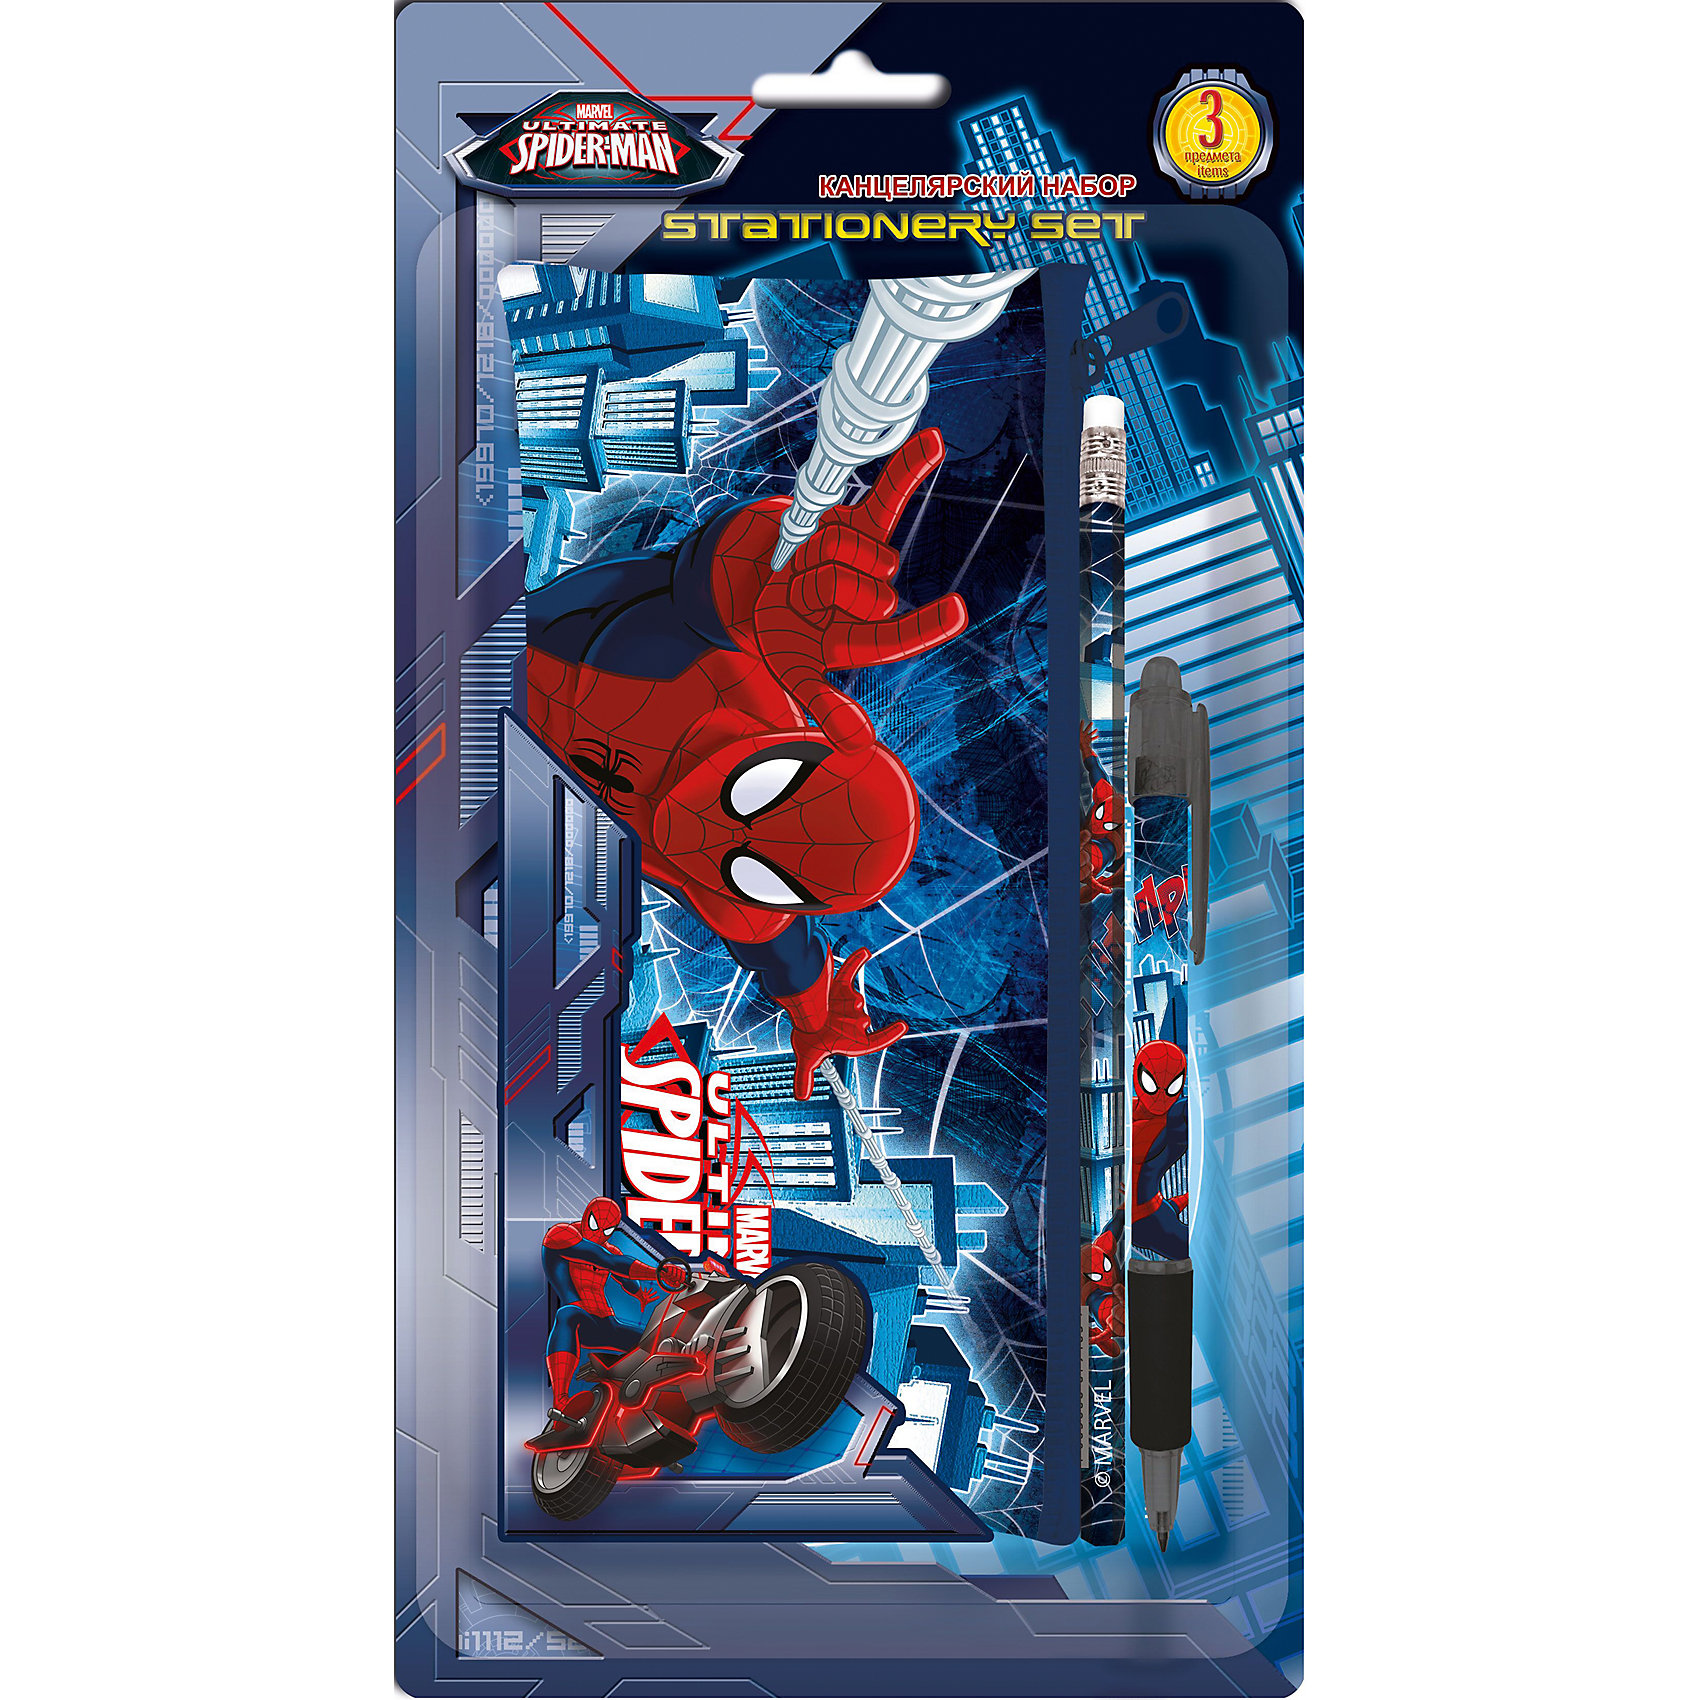 Академия групп Канцелярский набор Человек-Паук (3 предмета) академия групп пенал человек паук